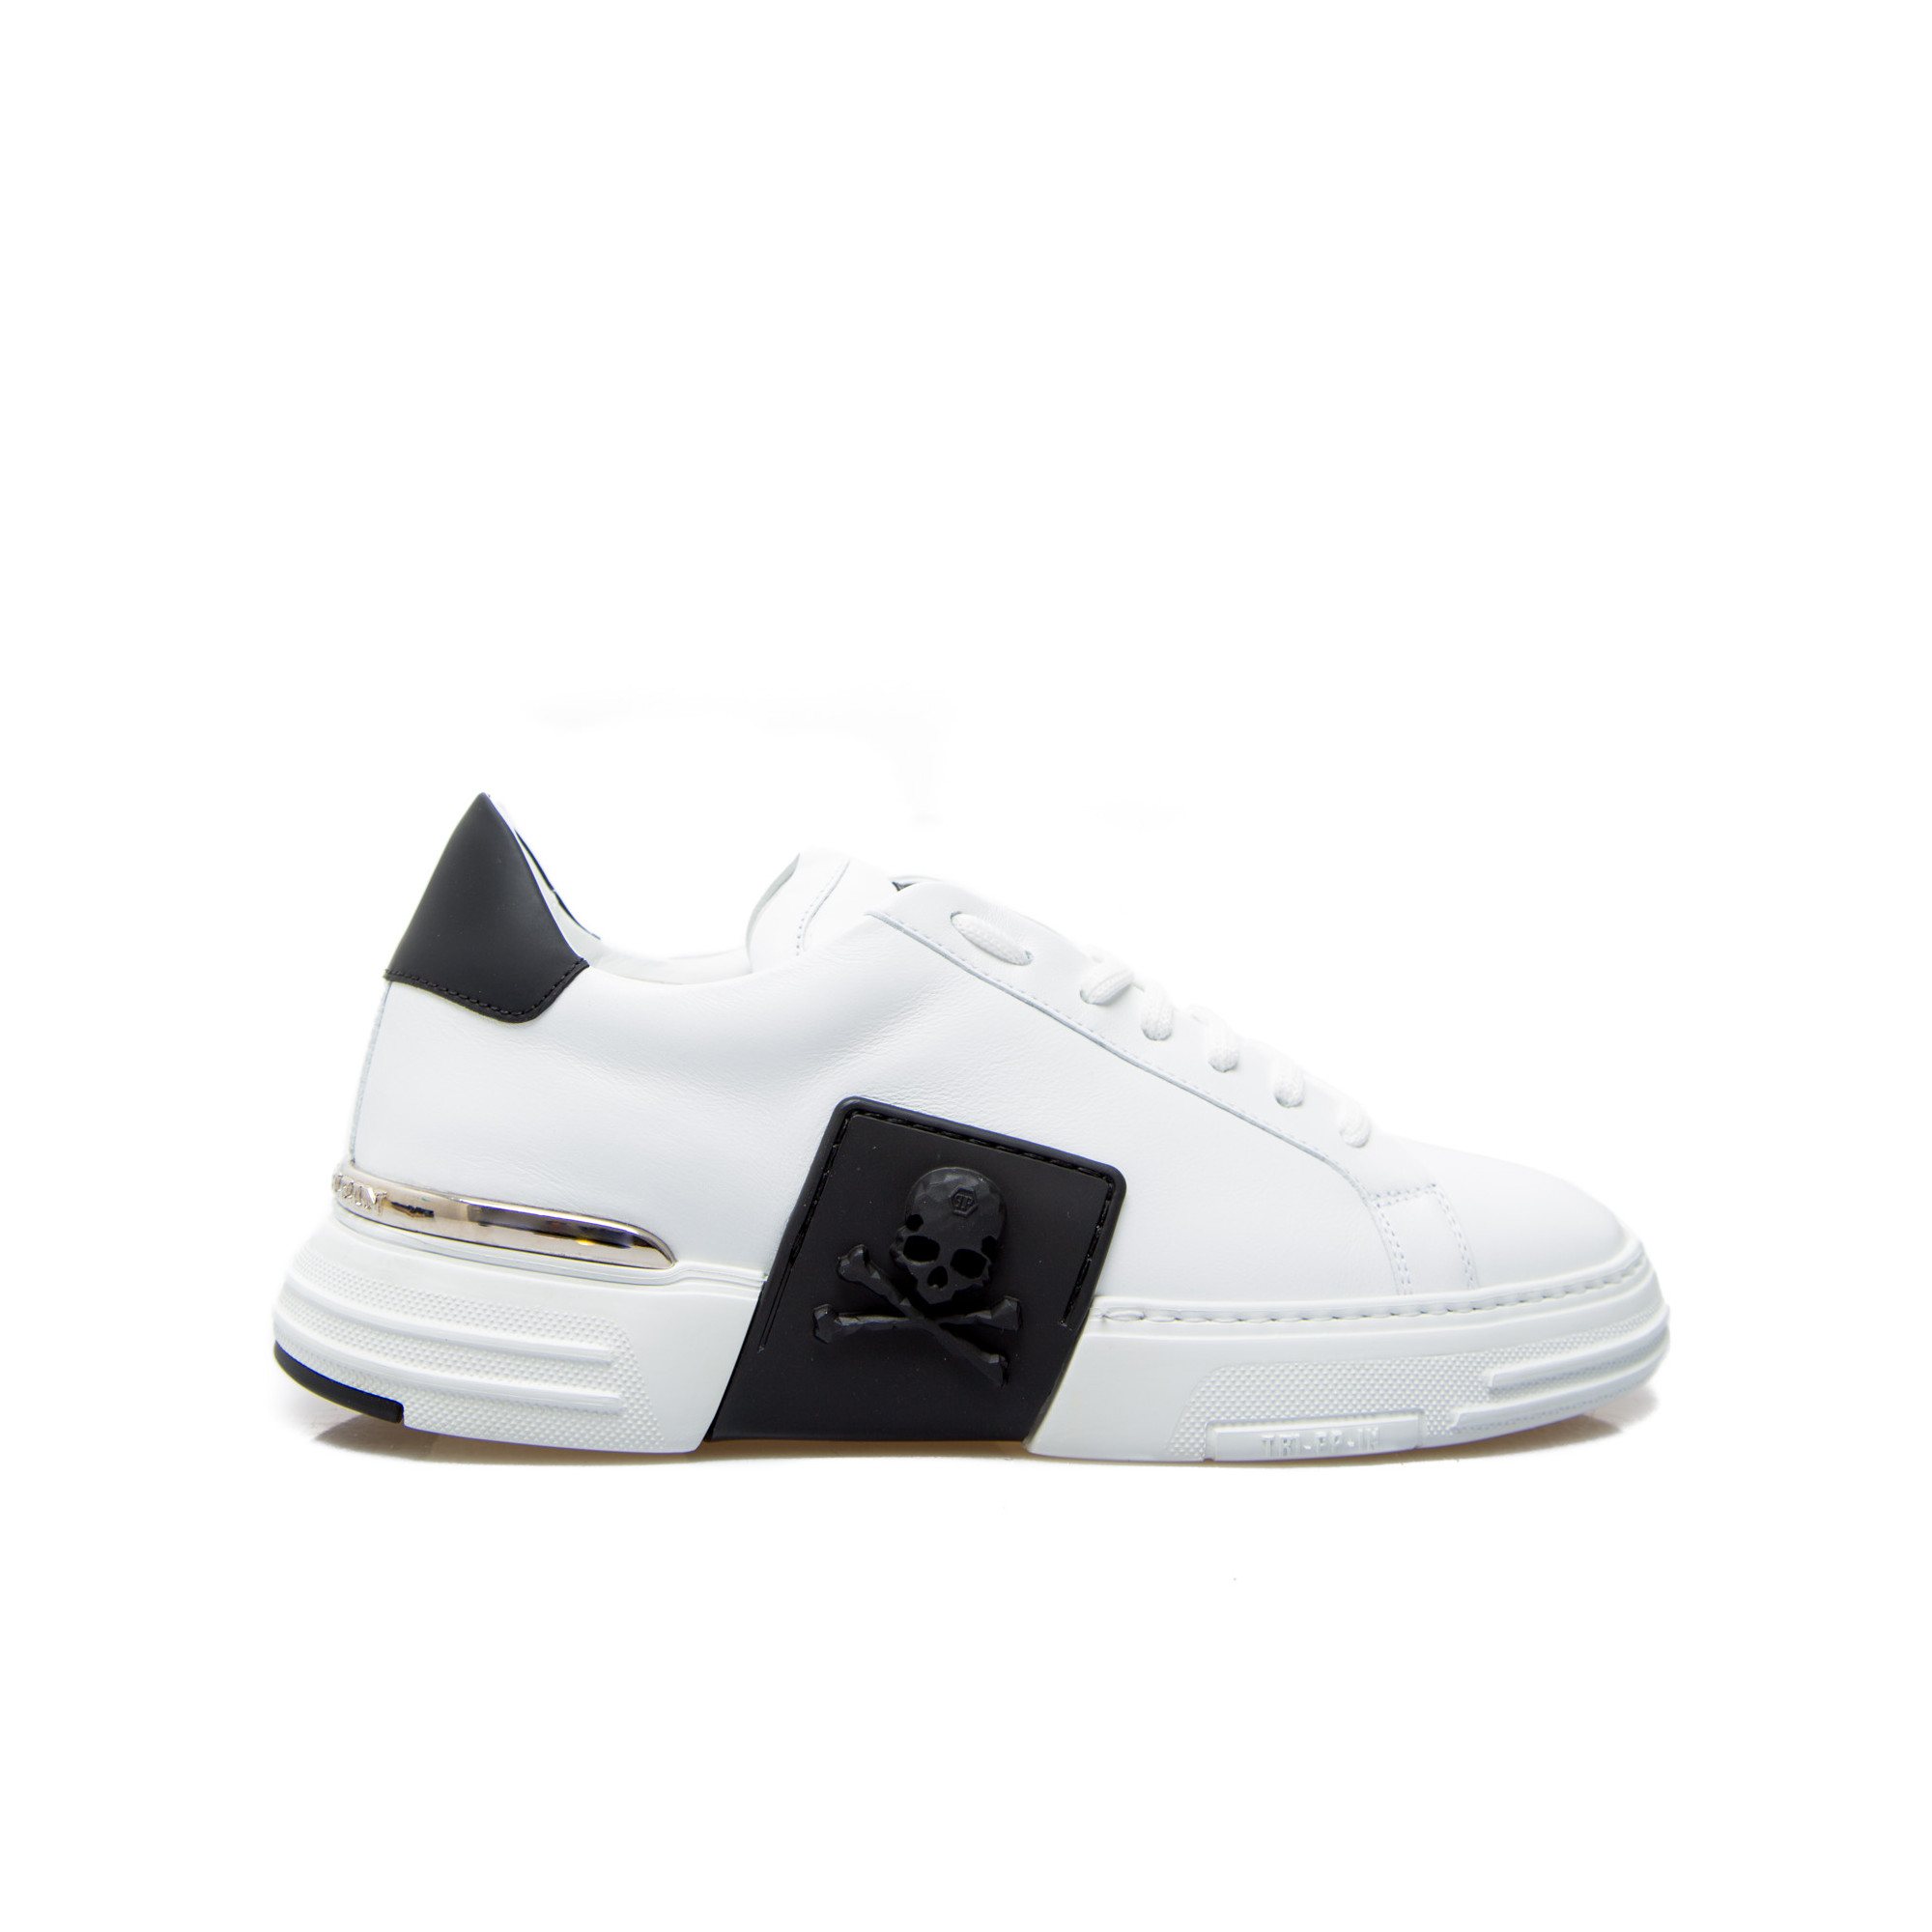 Philipp Plein Lo top Sneaker Statement Wit |